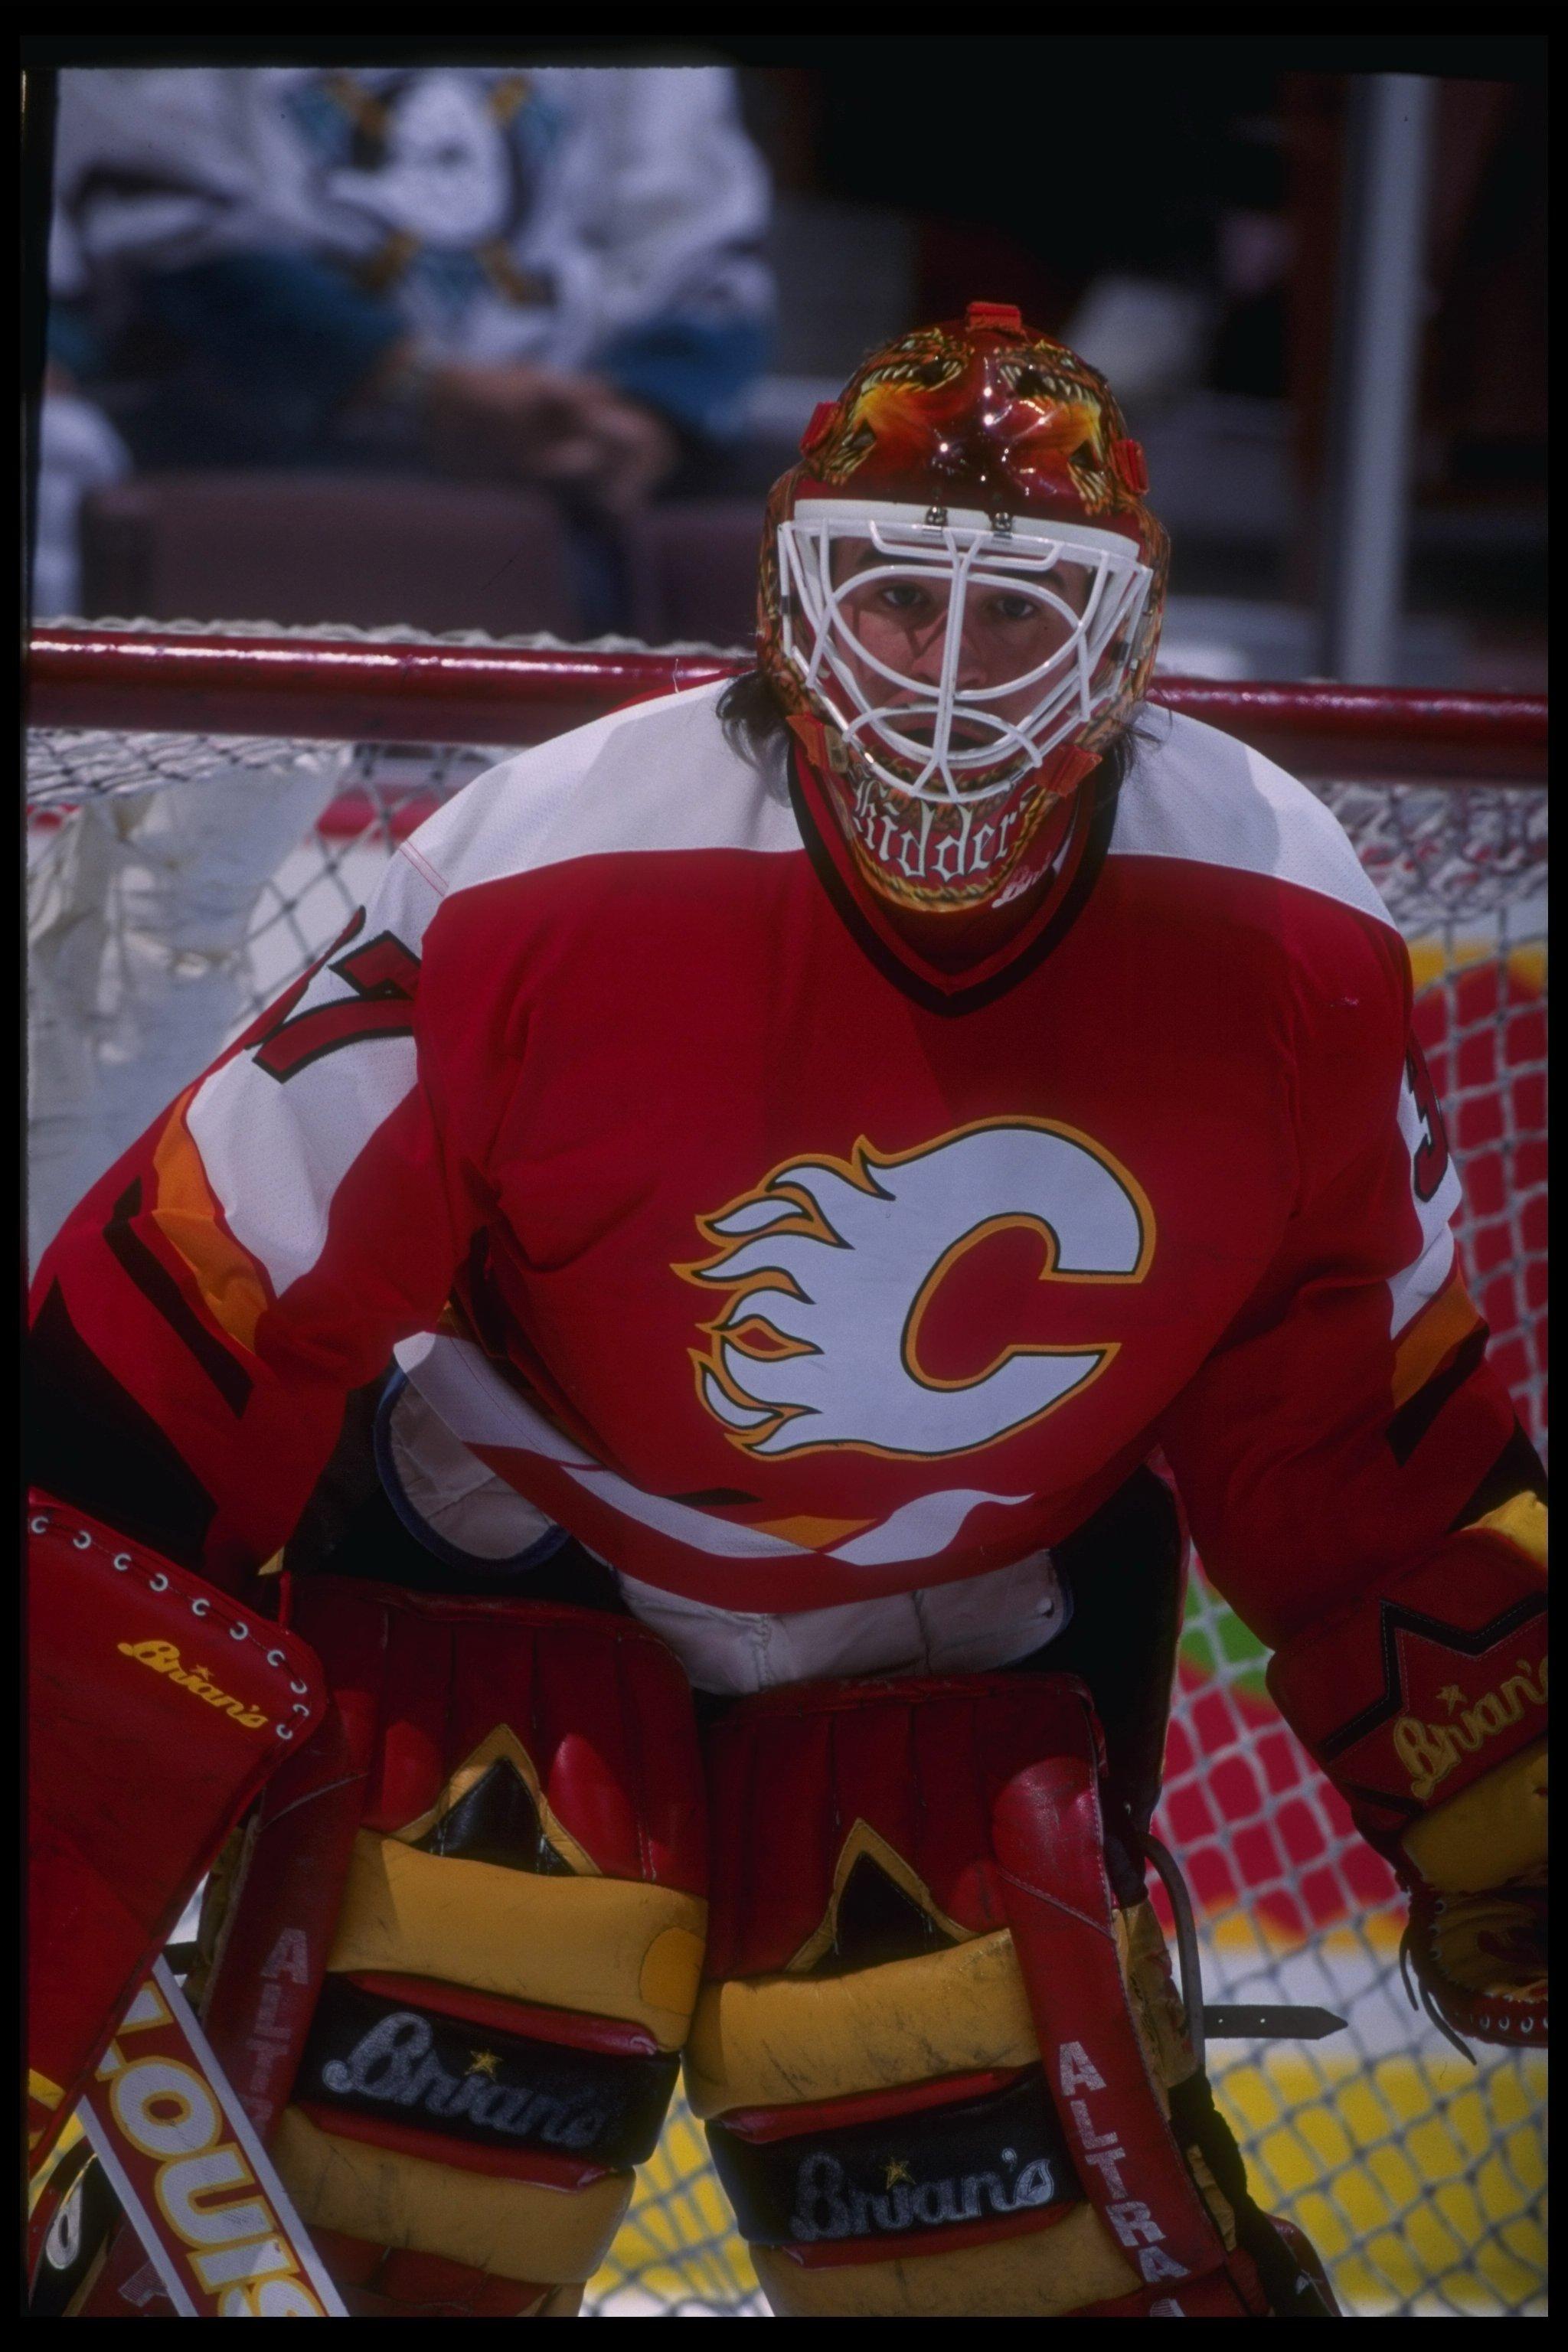 19658acb3 26 Feb 1996  Goaltender Trevor Kidd of the Calgary Flames looks on during a  game